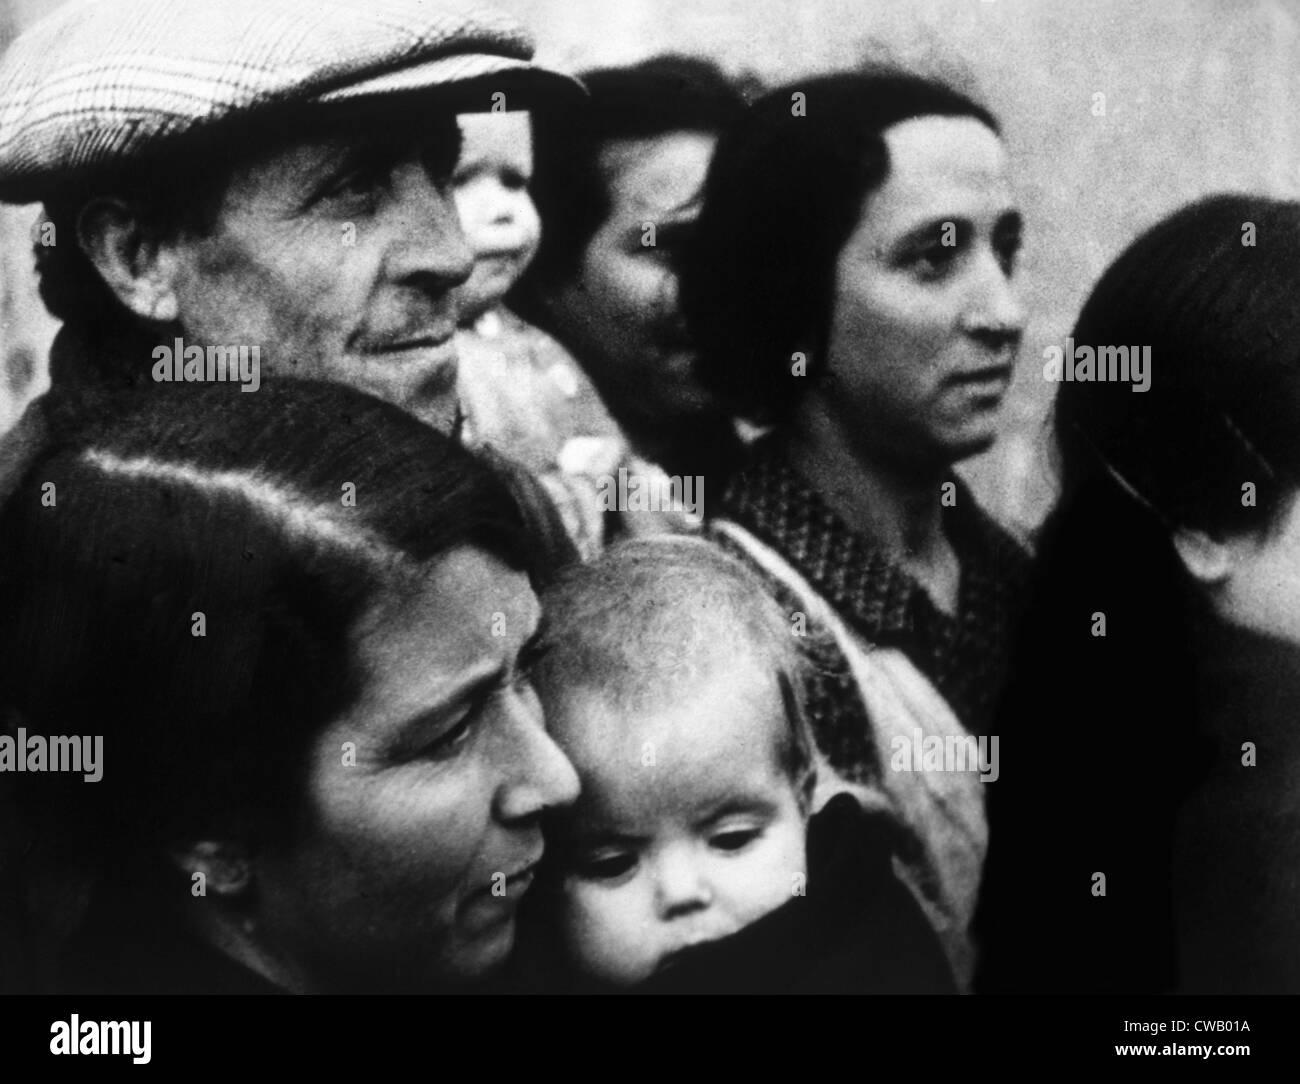 Spanish Civil War (1936-1939), civilians in Madrid, 1937. - Stock Image